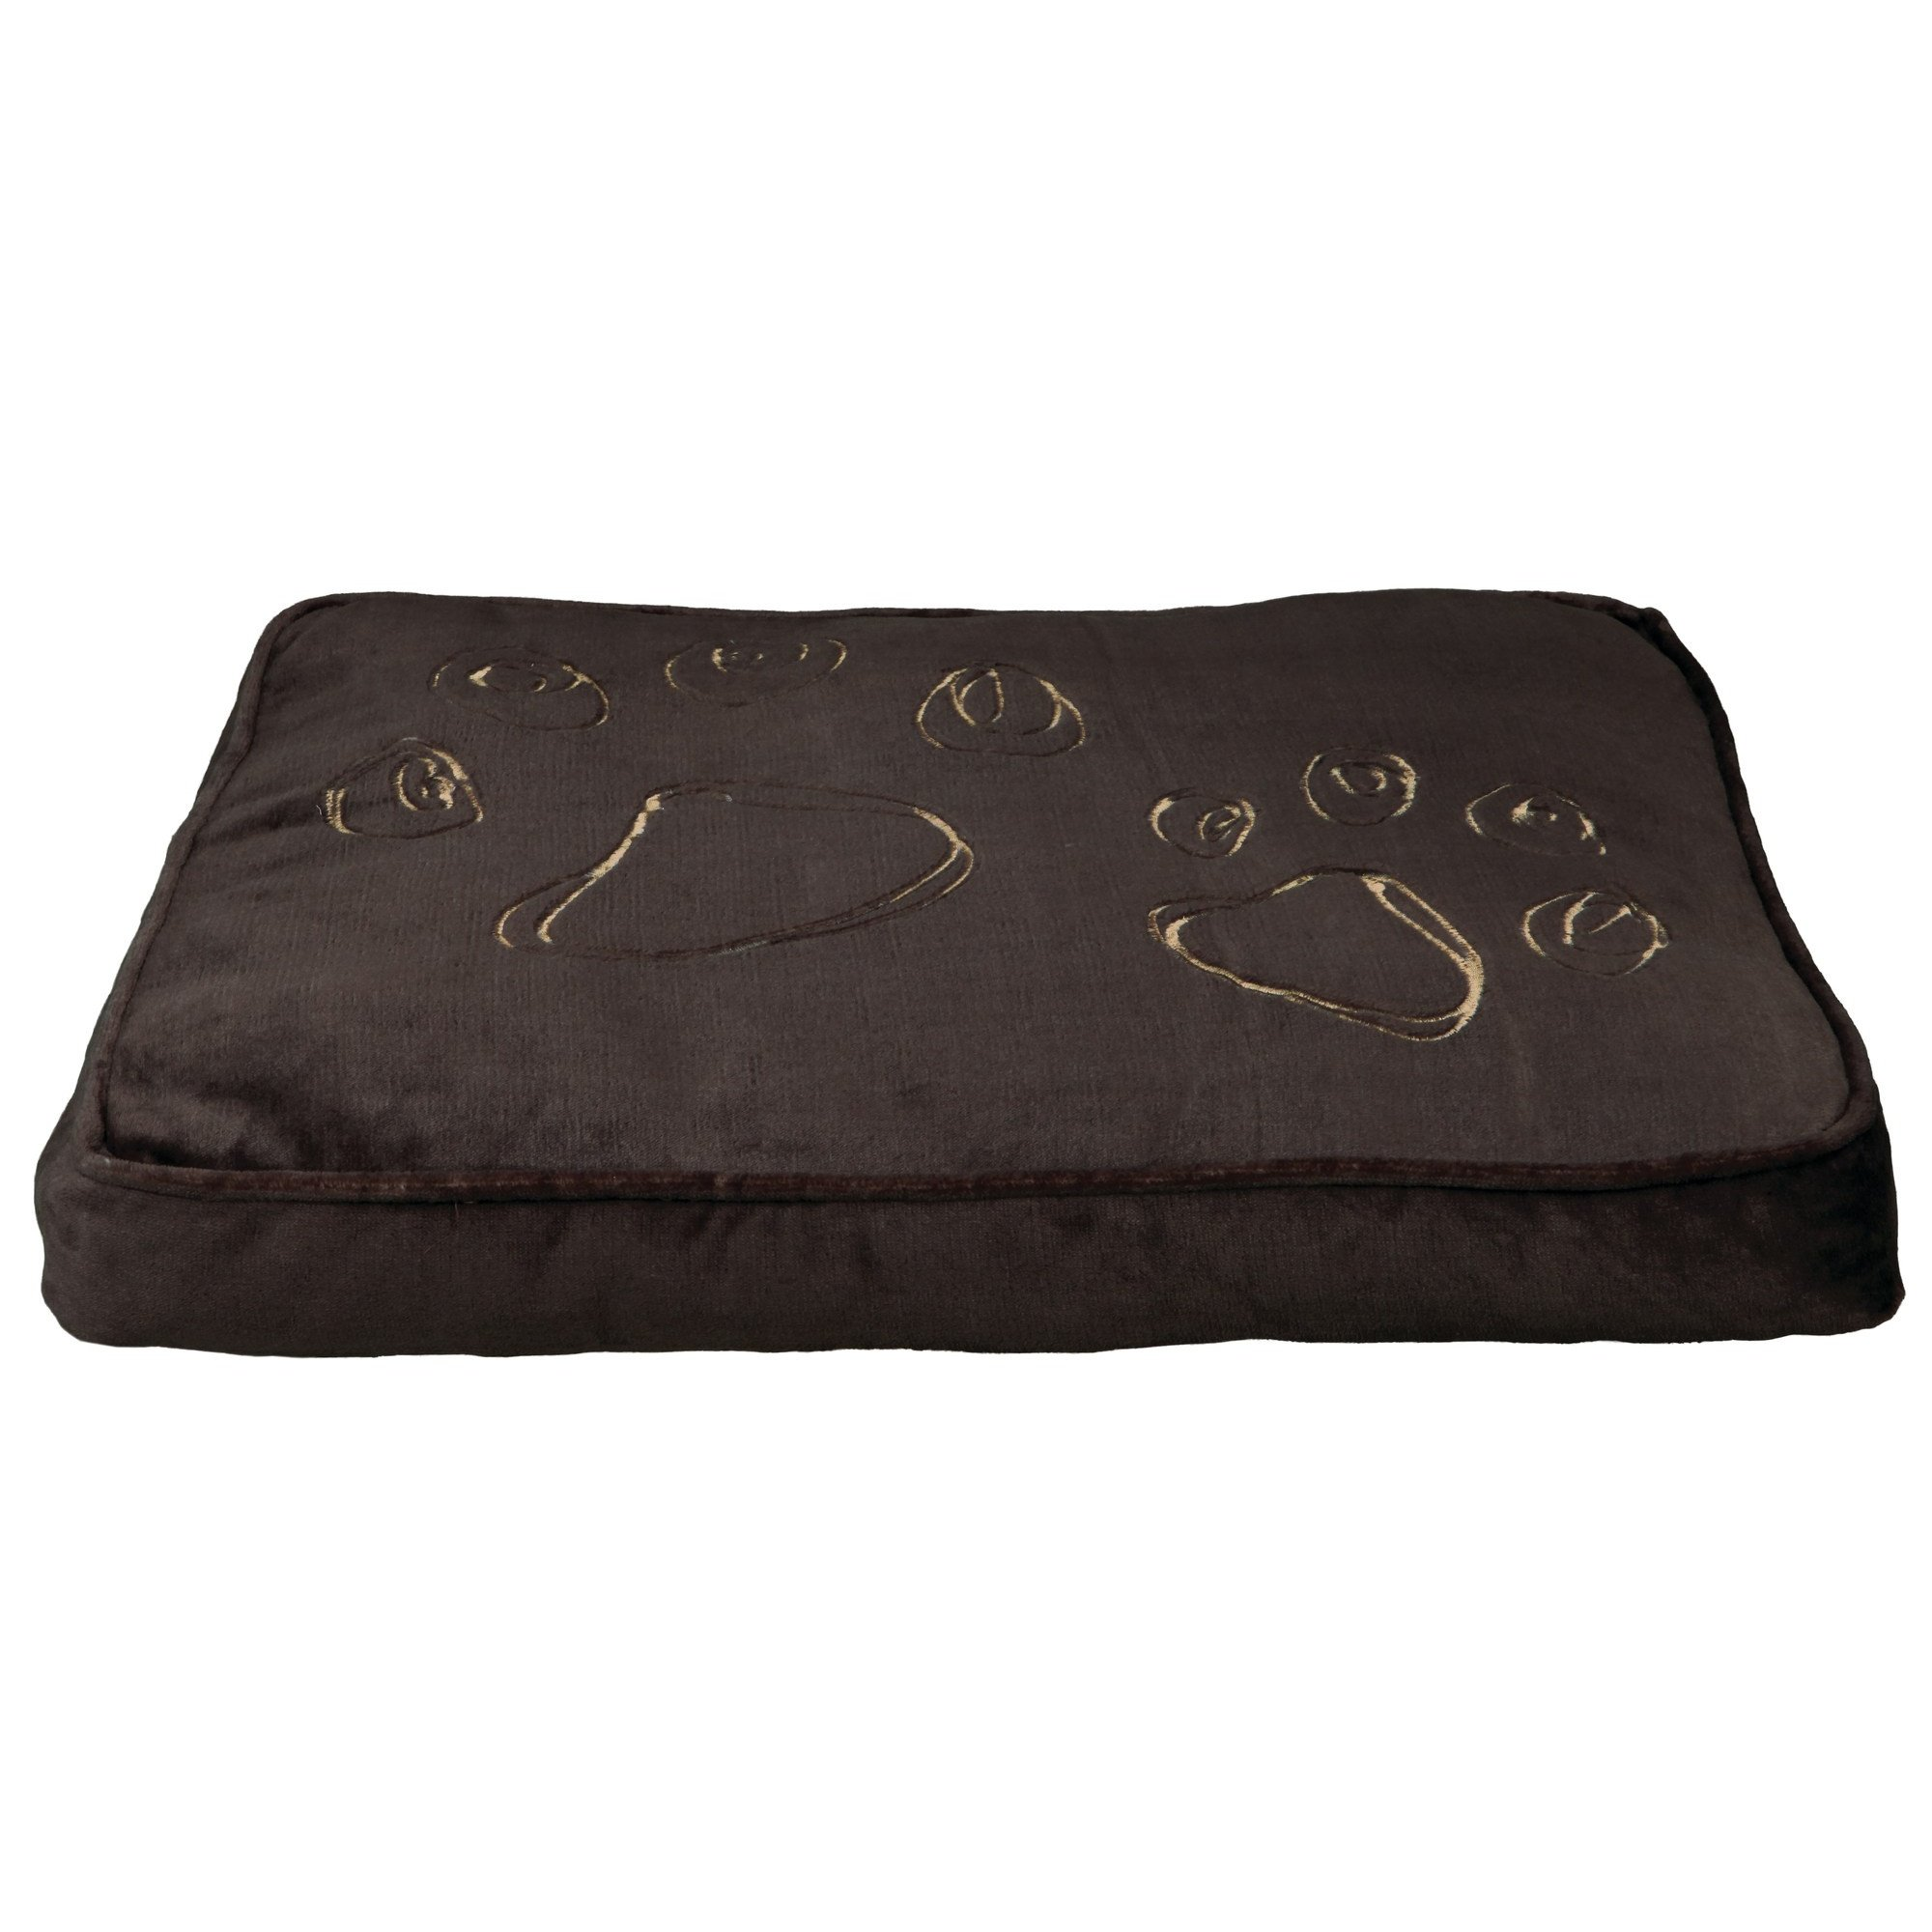 Trixie Milo Dog Pillow (31.49 x 21.65 inch) (Brown)